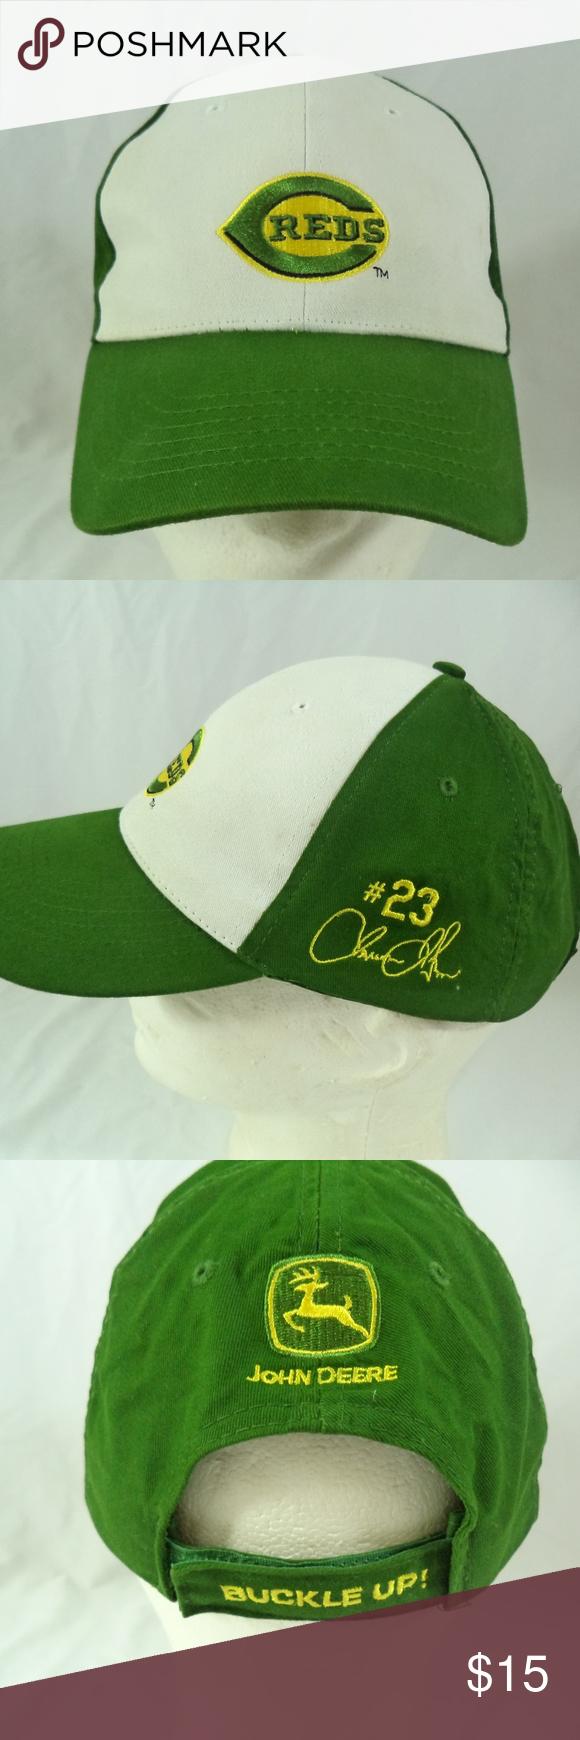 1969aefb364eb Cincinnati Reds John Deere Jason LaRue  23 Cap Hat Super cool cap ...